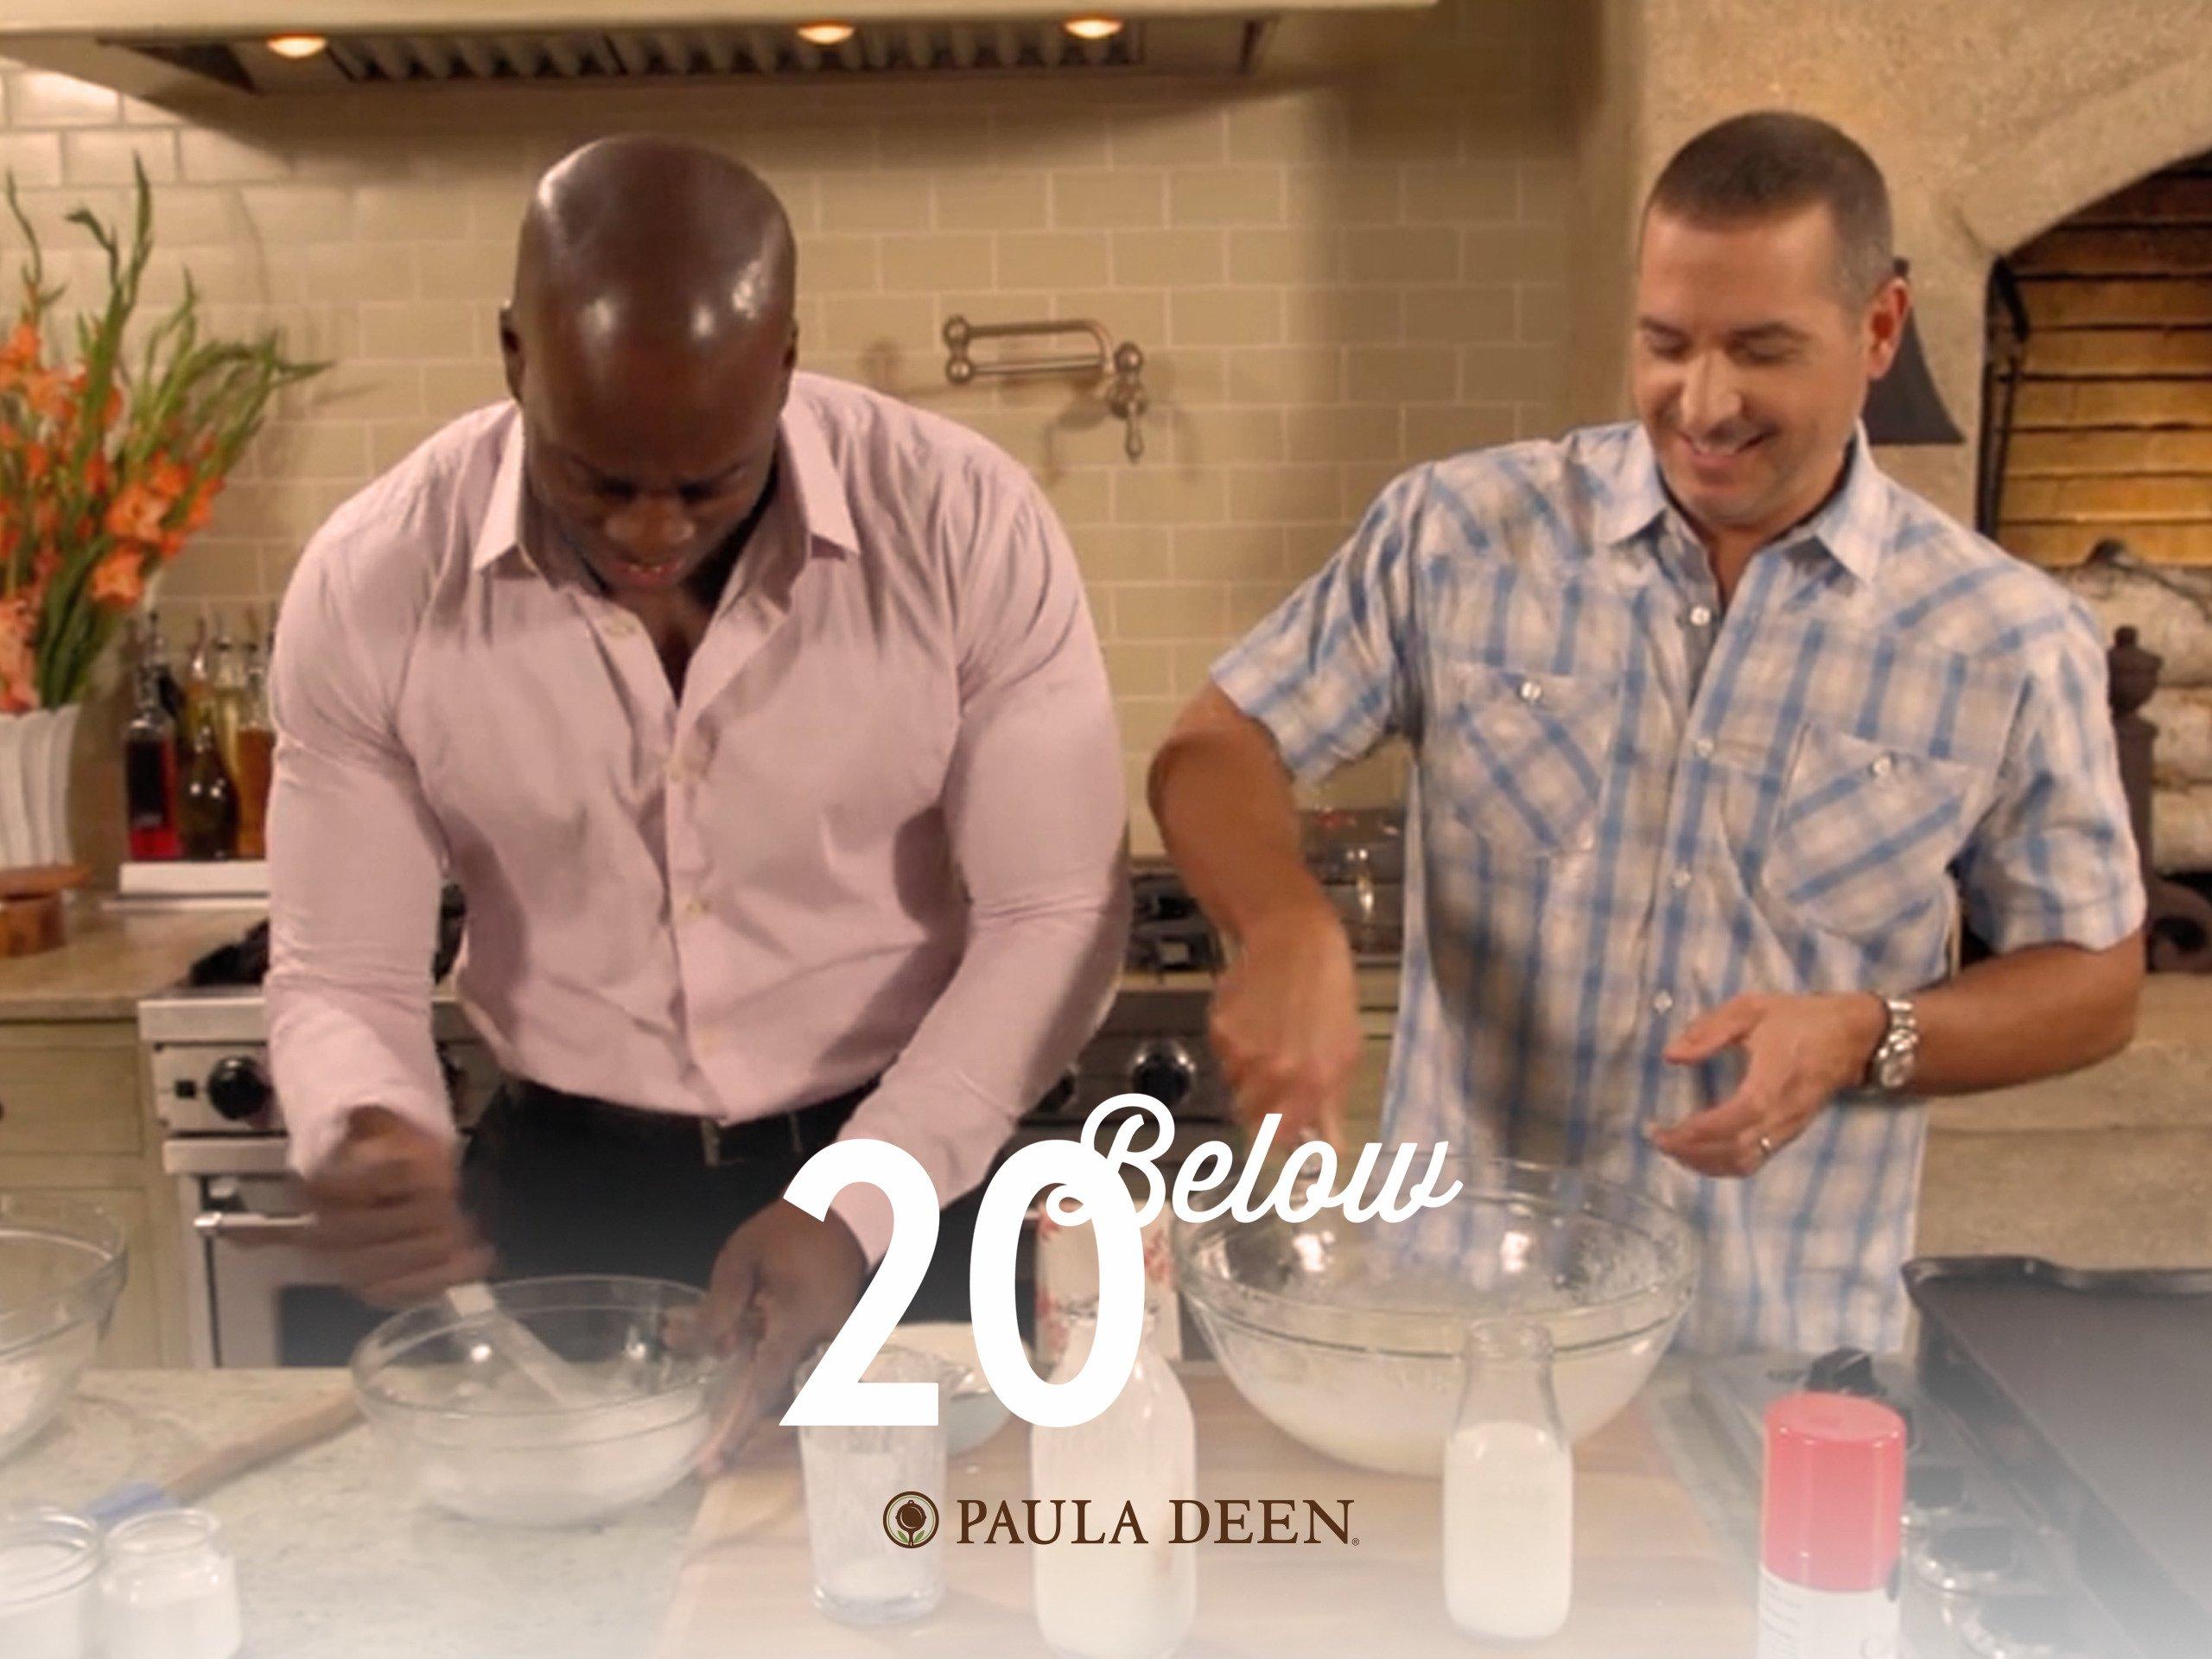 Watch 20 Below Season 1 Prime Video